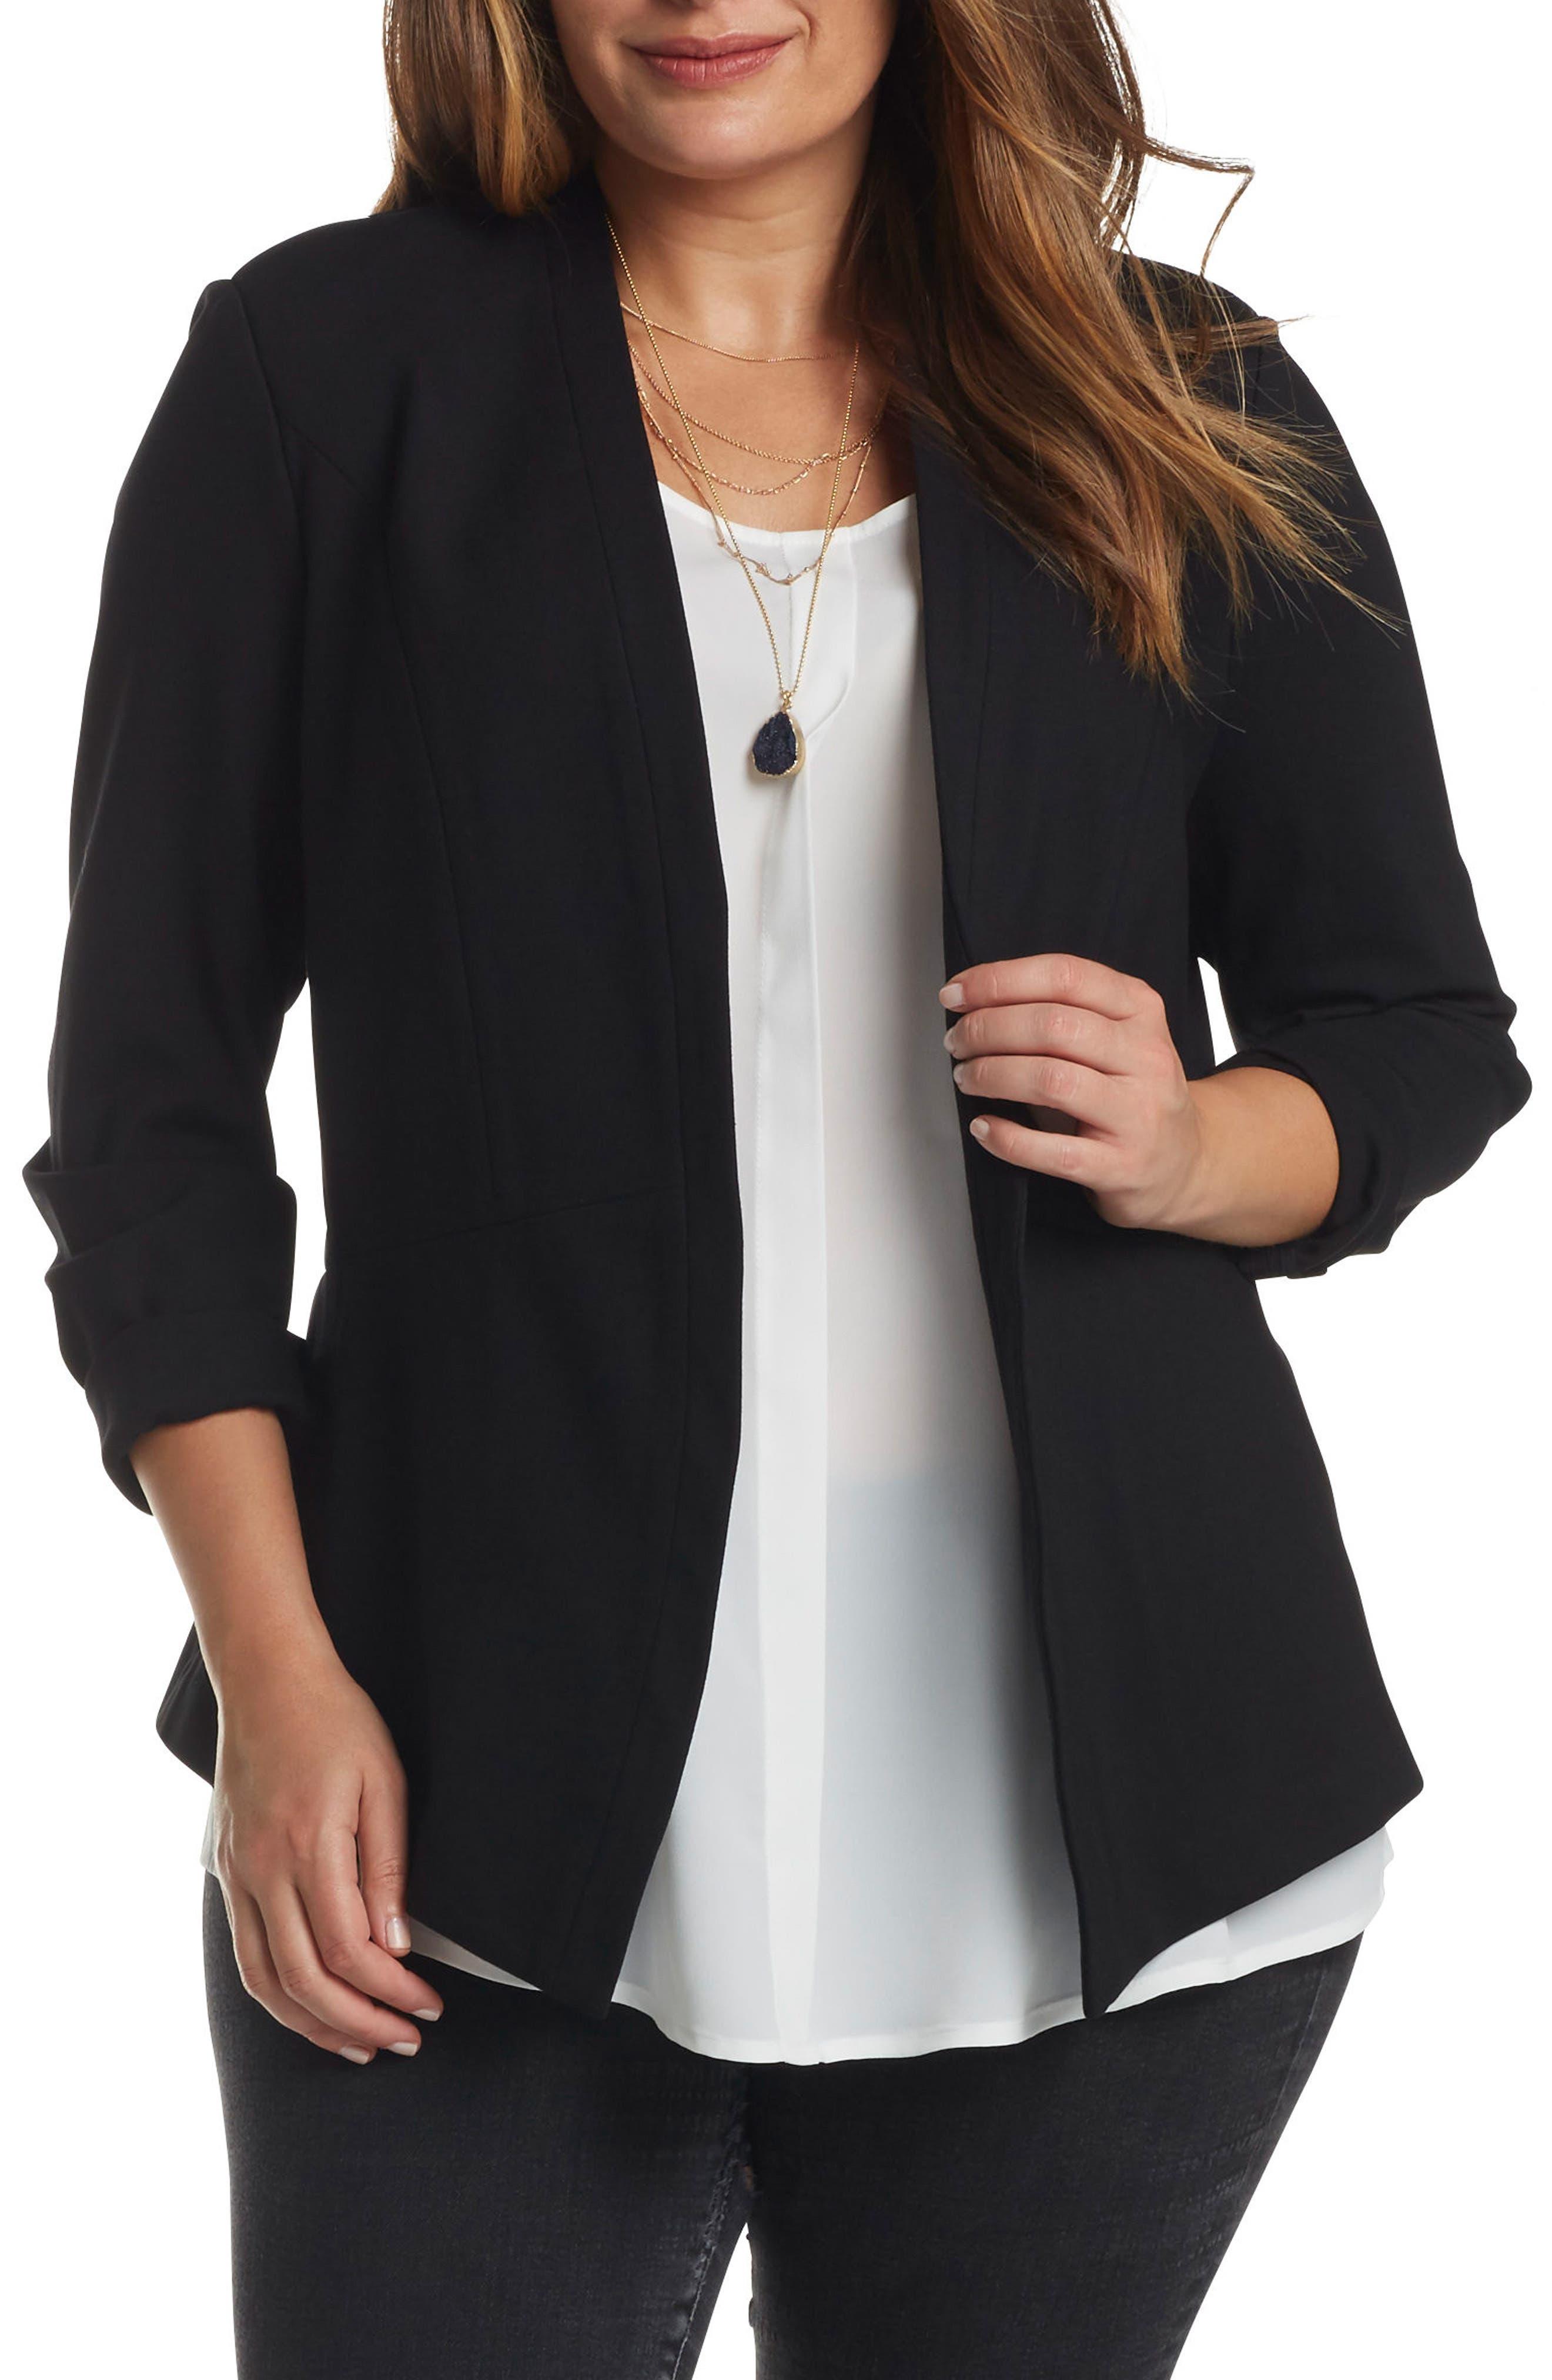 Main Image - Tart 'Annabella' Open Front Blazer (Plus Size)